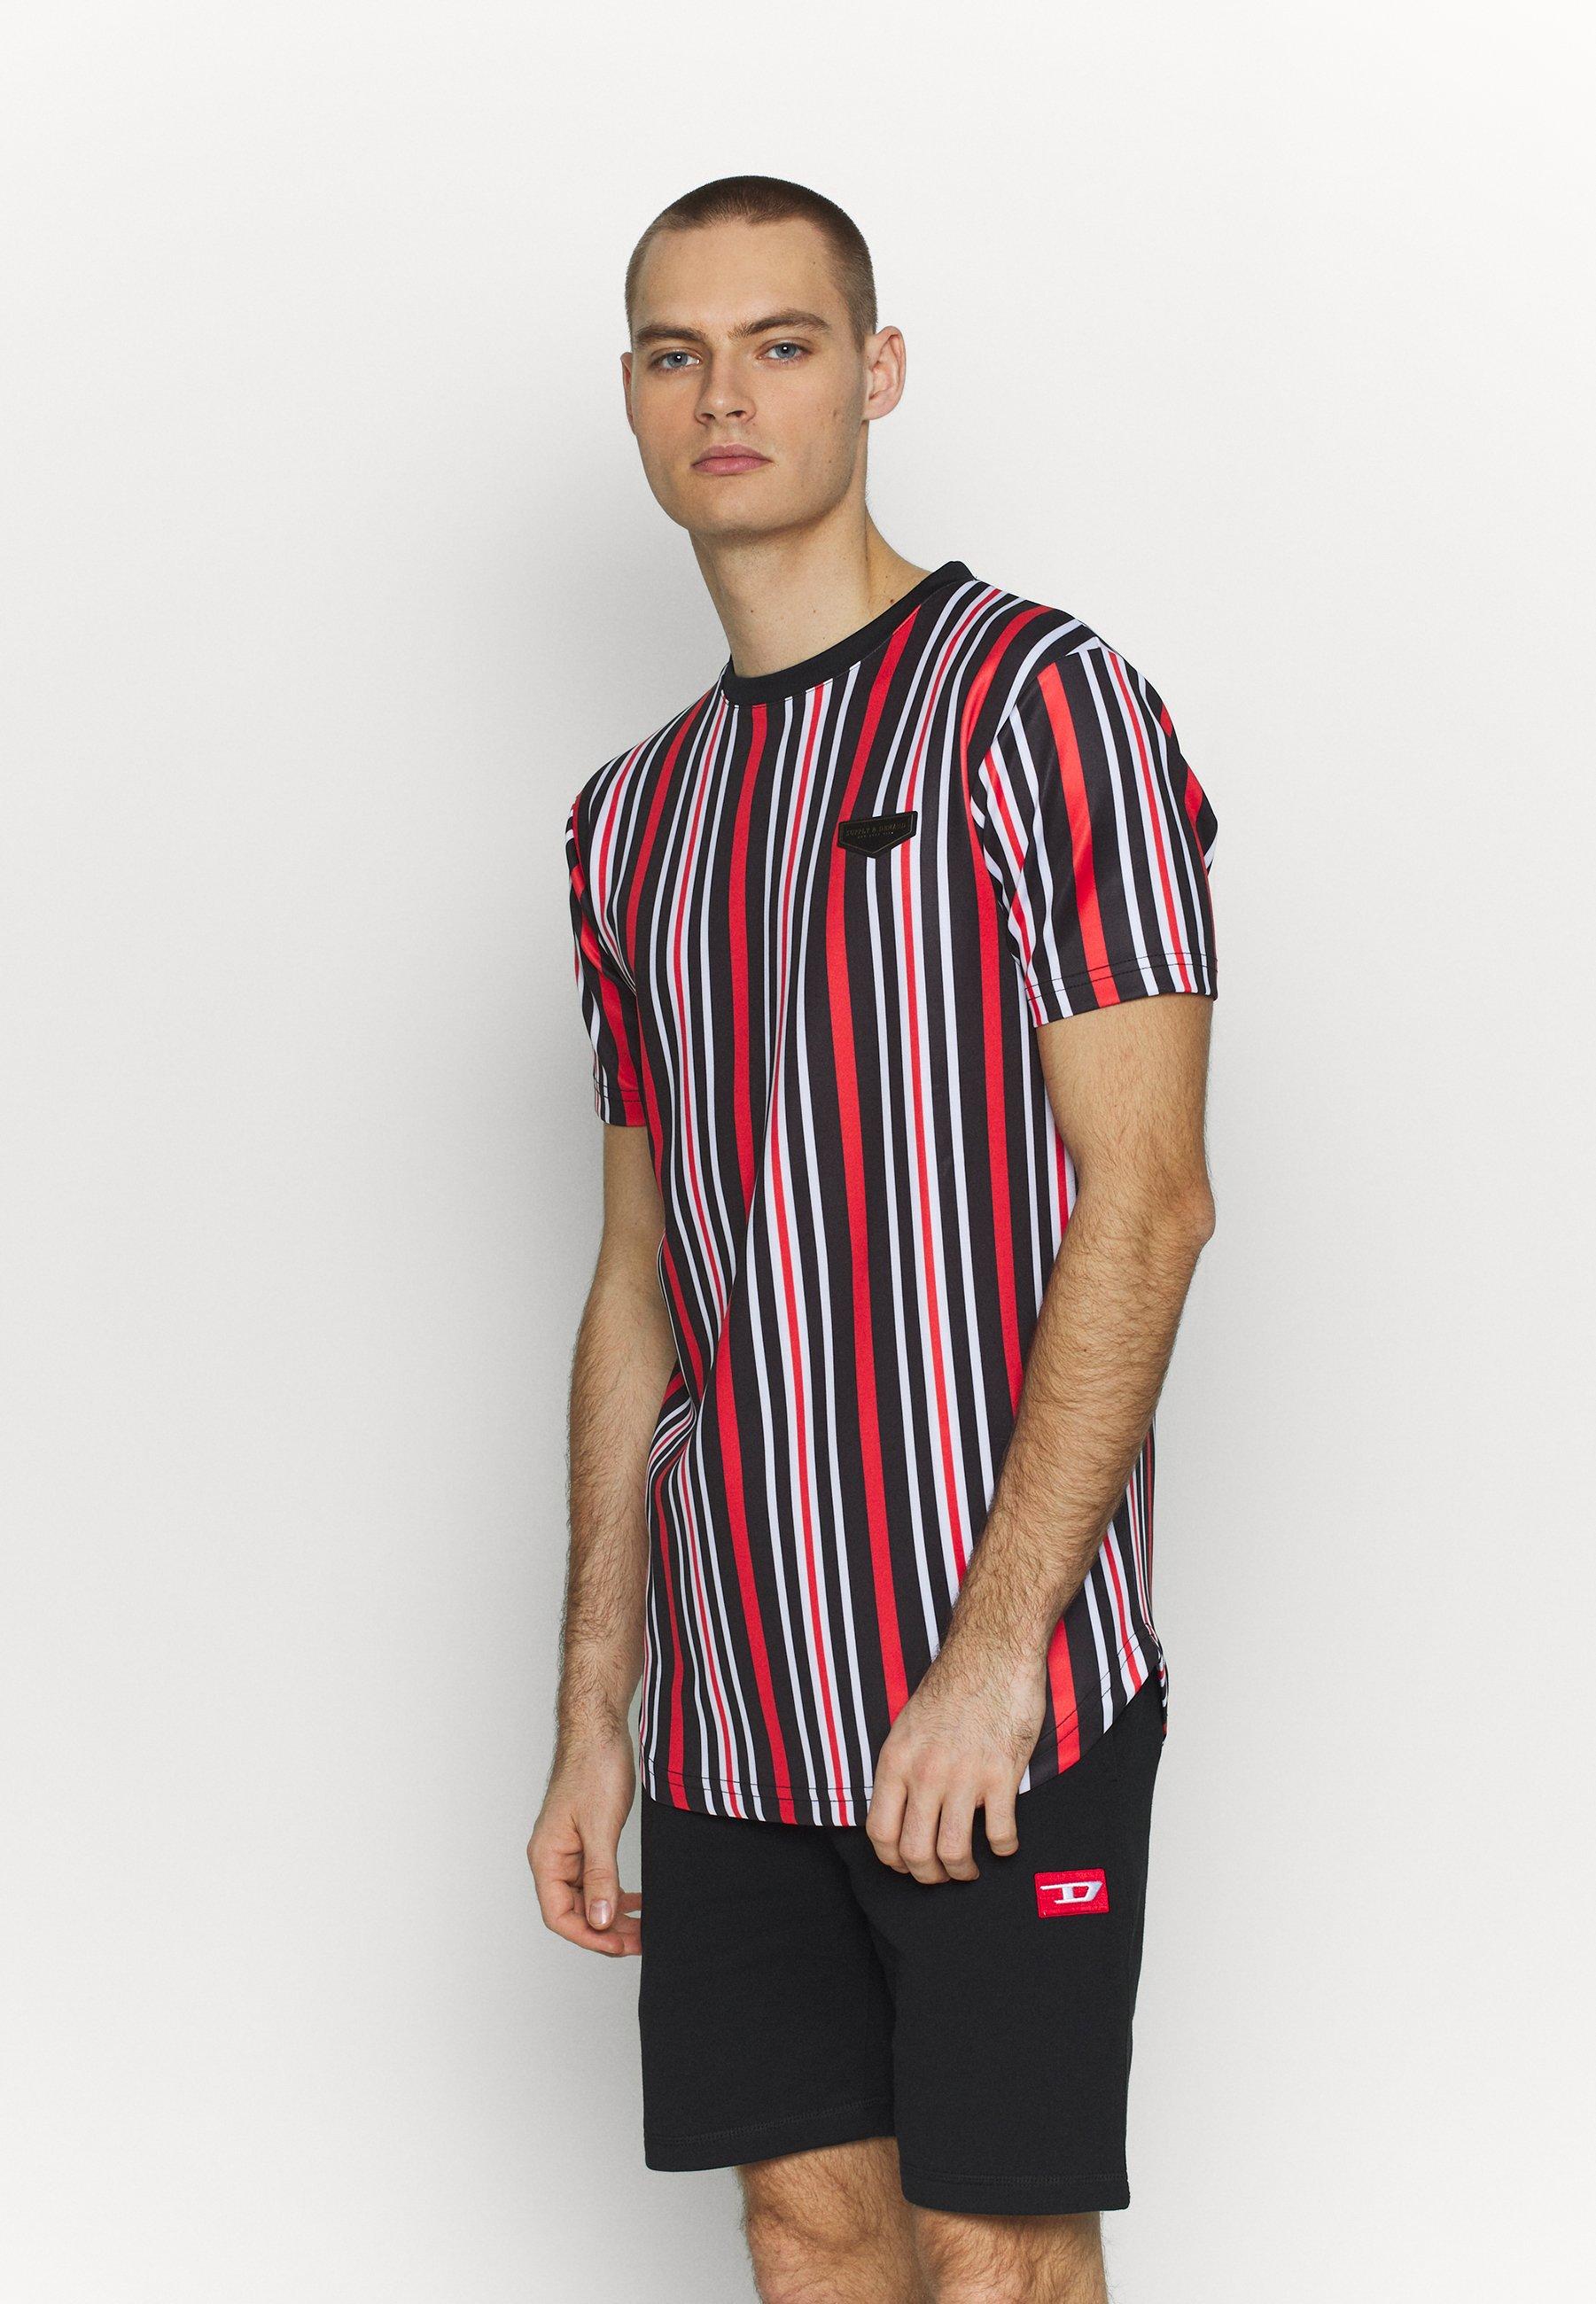 Supply & Demand PIN VERTICAL STRIPE - T-shirt med print - black/red - Herrkläder Rabatter